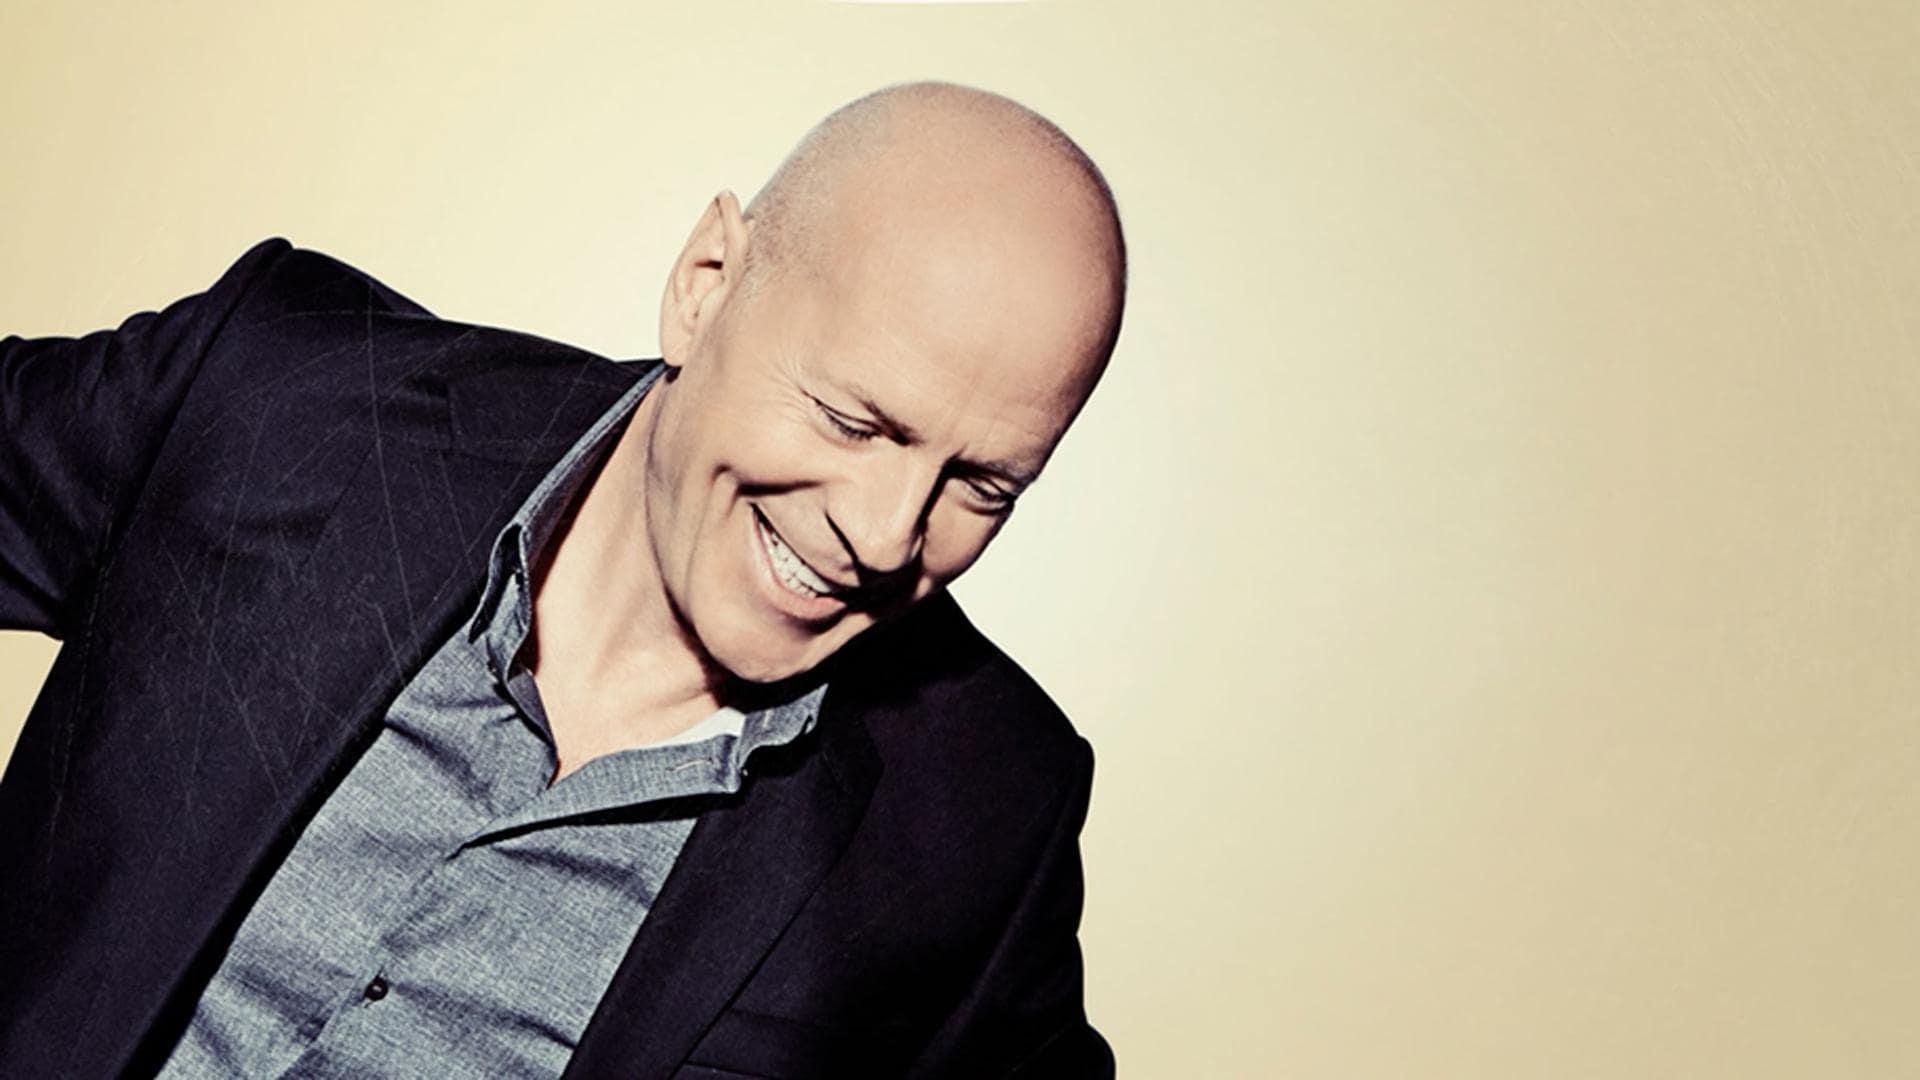 Bruce Willis: October 12, 2013